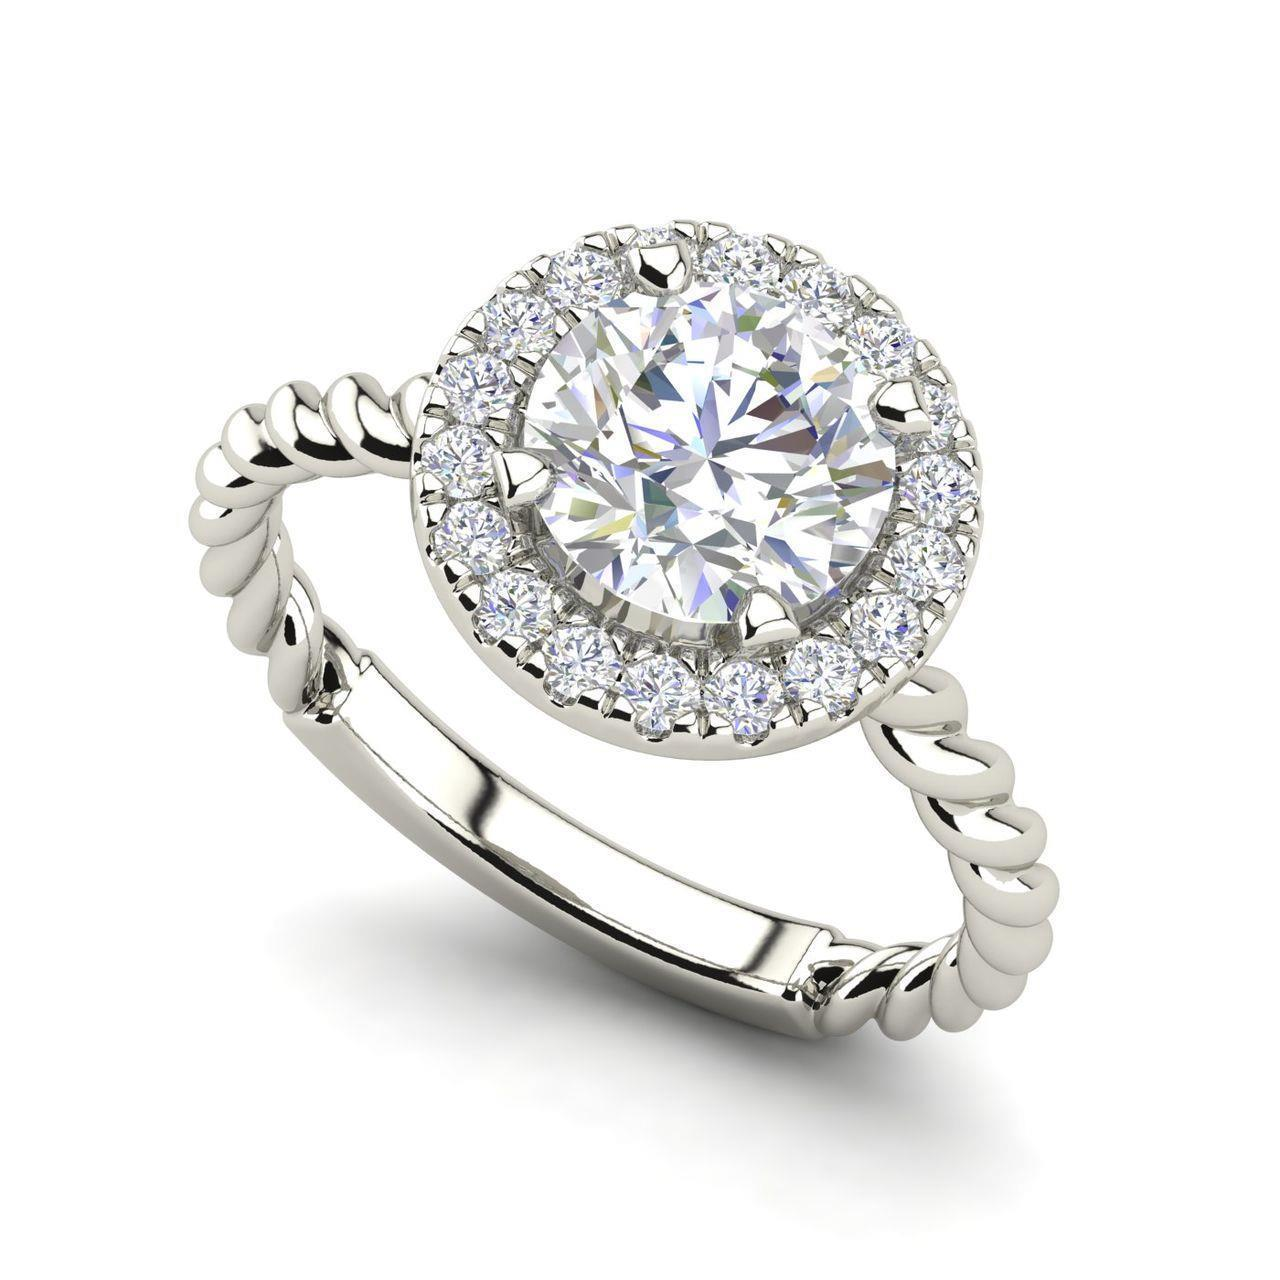 f48674d1096 Details about Pave Halo Twist 1.9 Carat VS1 H Round Cut Diamond Engagement  Ring White Gold